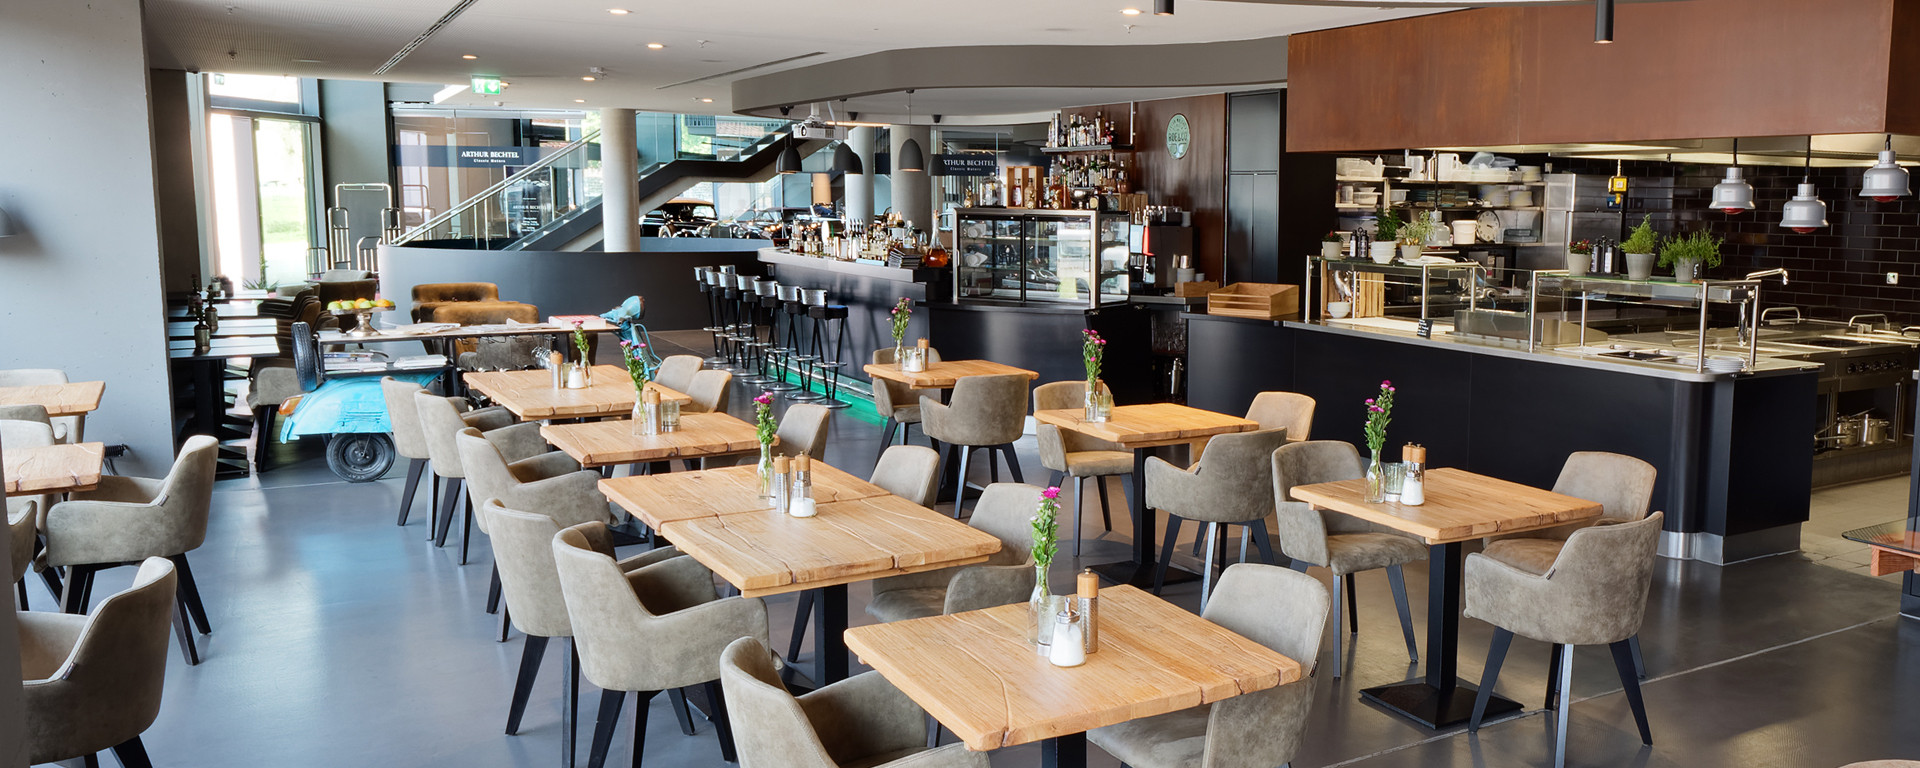 V8 HOTEL Restaurant - Feste & Feiern - Hochzeitslocation